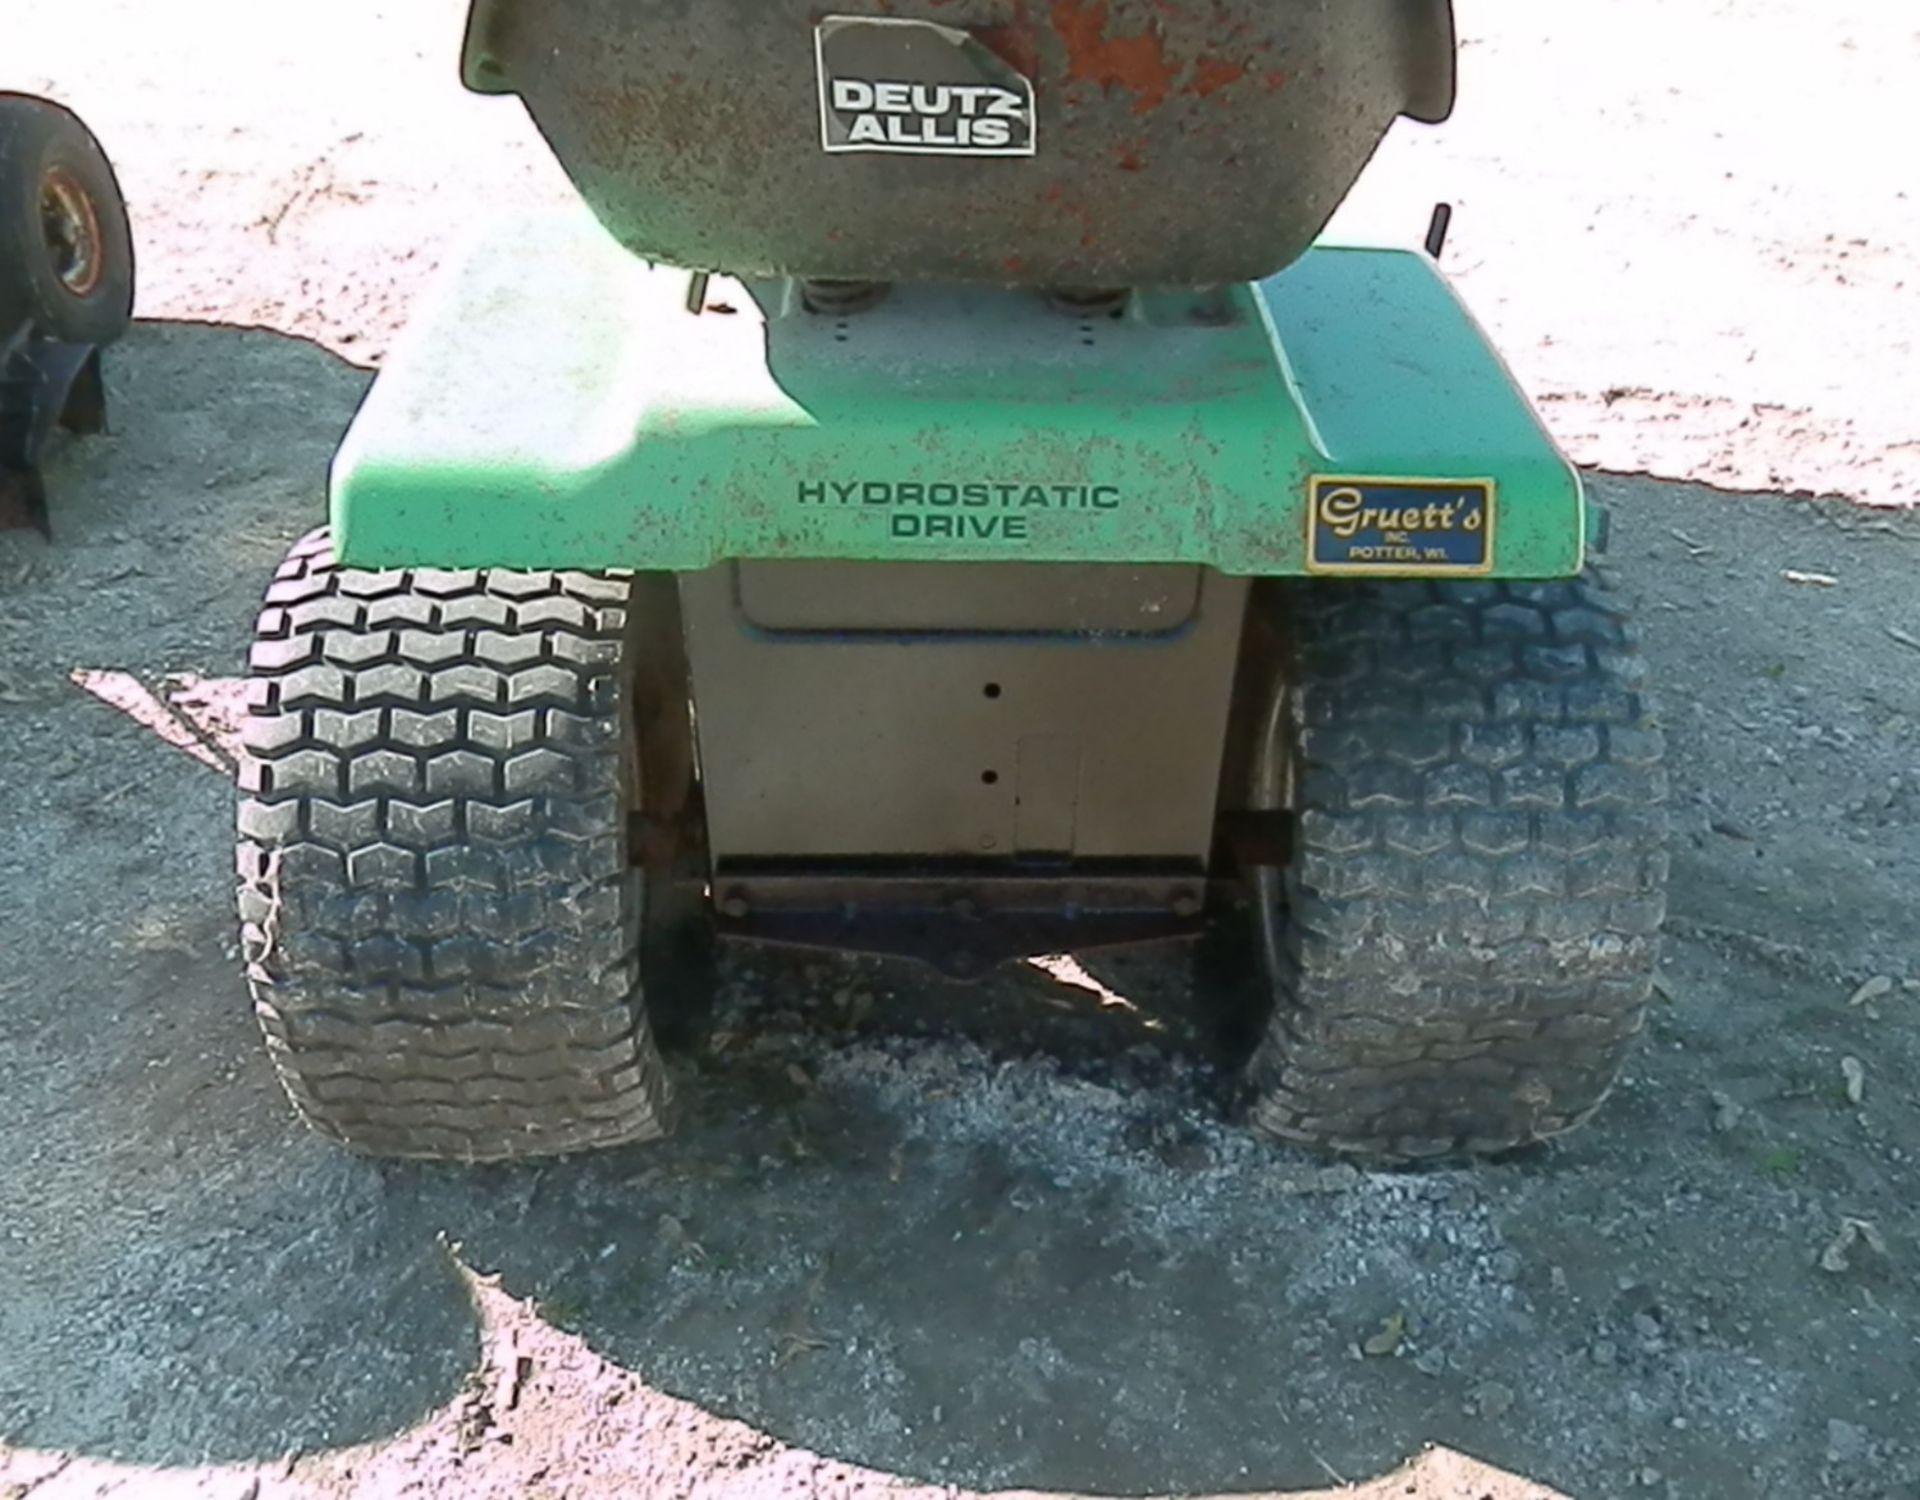 DEUTZ ALLIS 613 HYDRO LAWN TRACTOR - Image 4 of 5